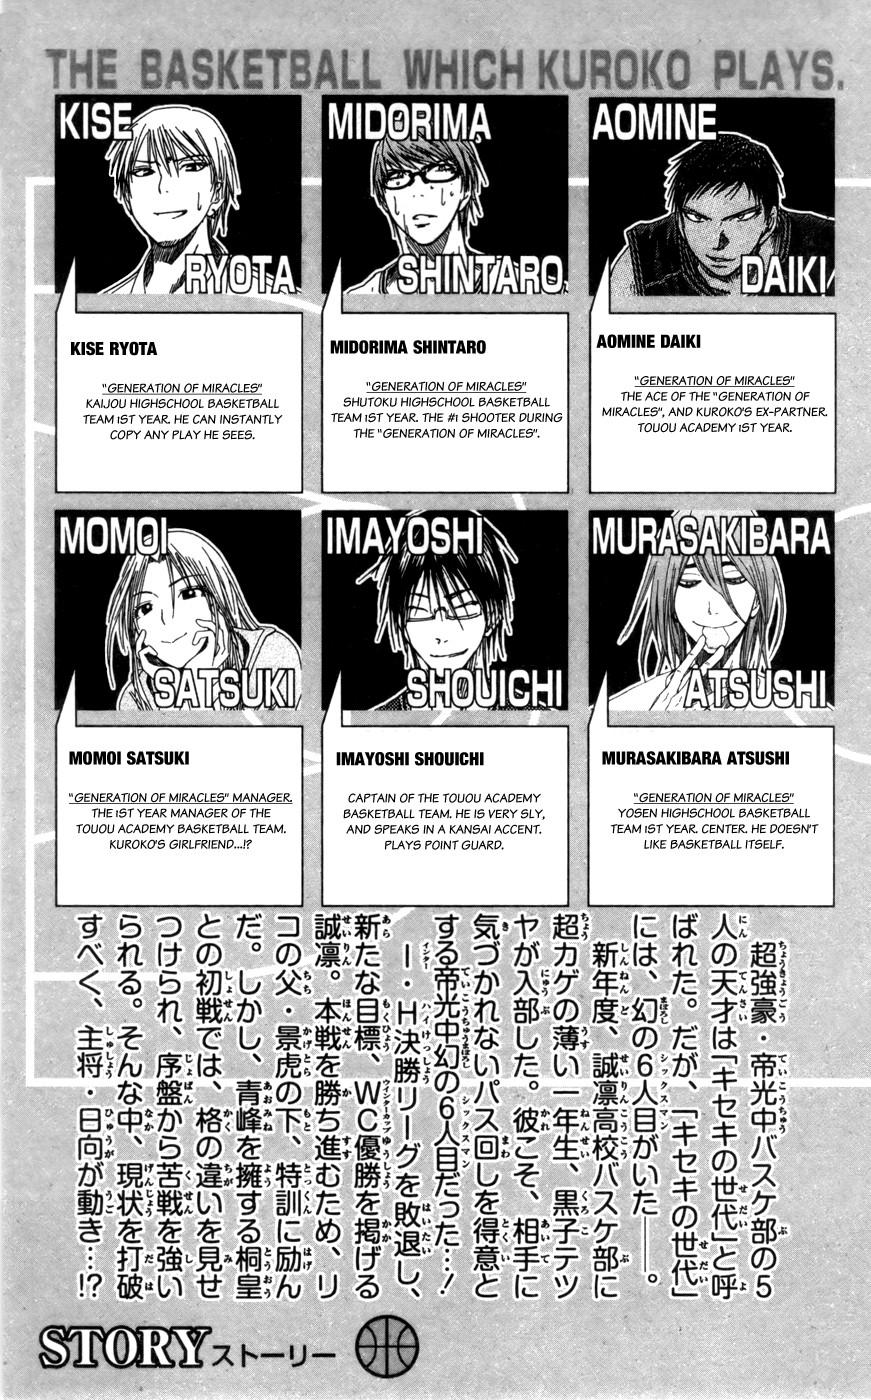 Kuroko no Basket Manga Chapter 118 - Image 4_005